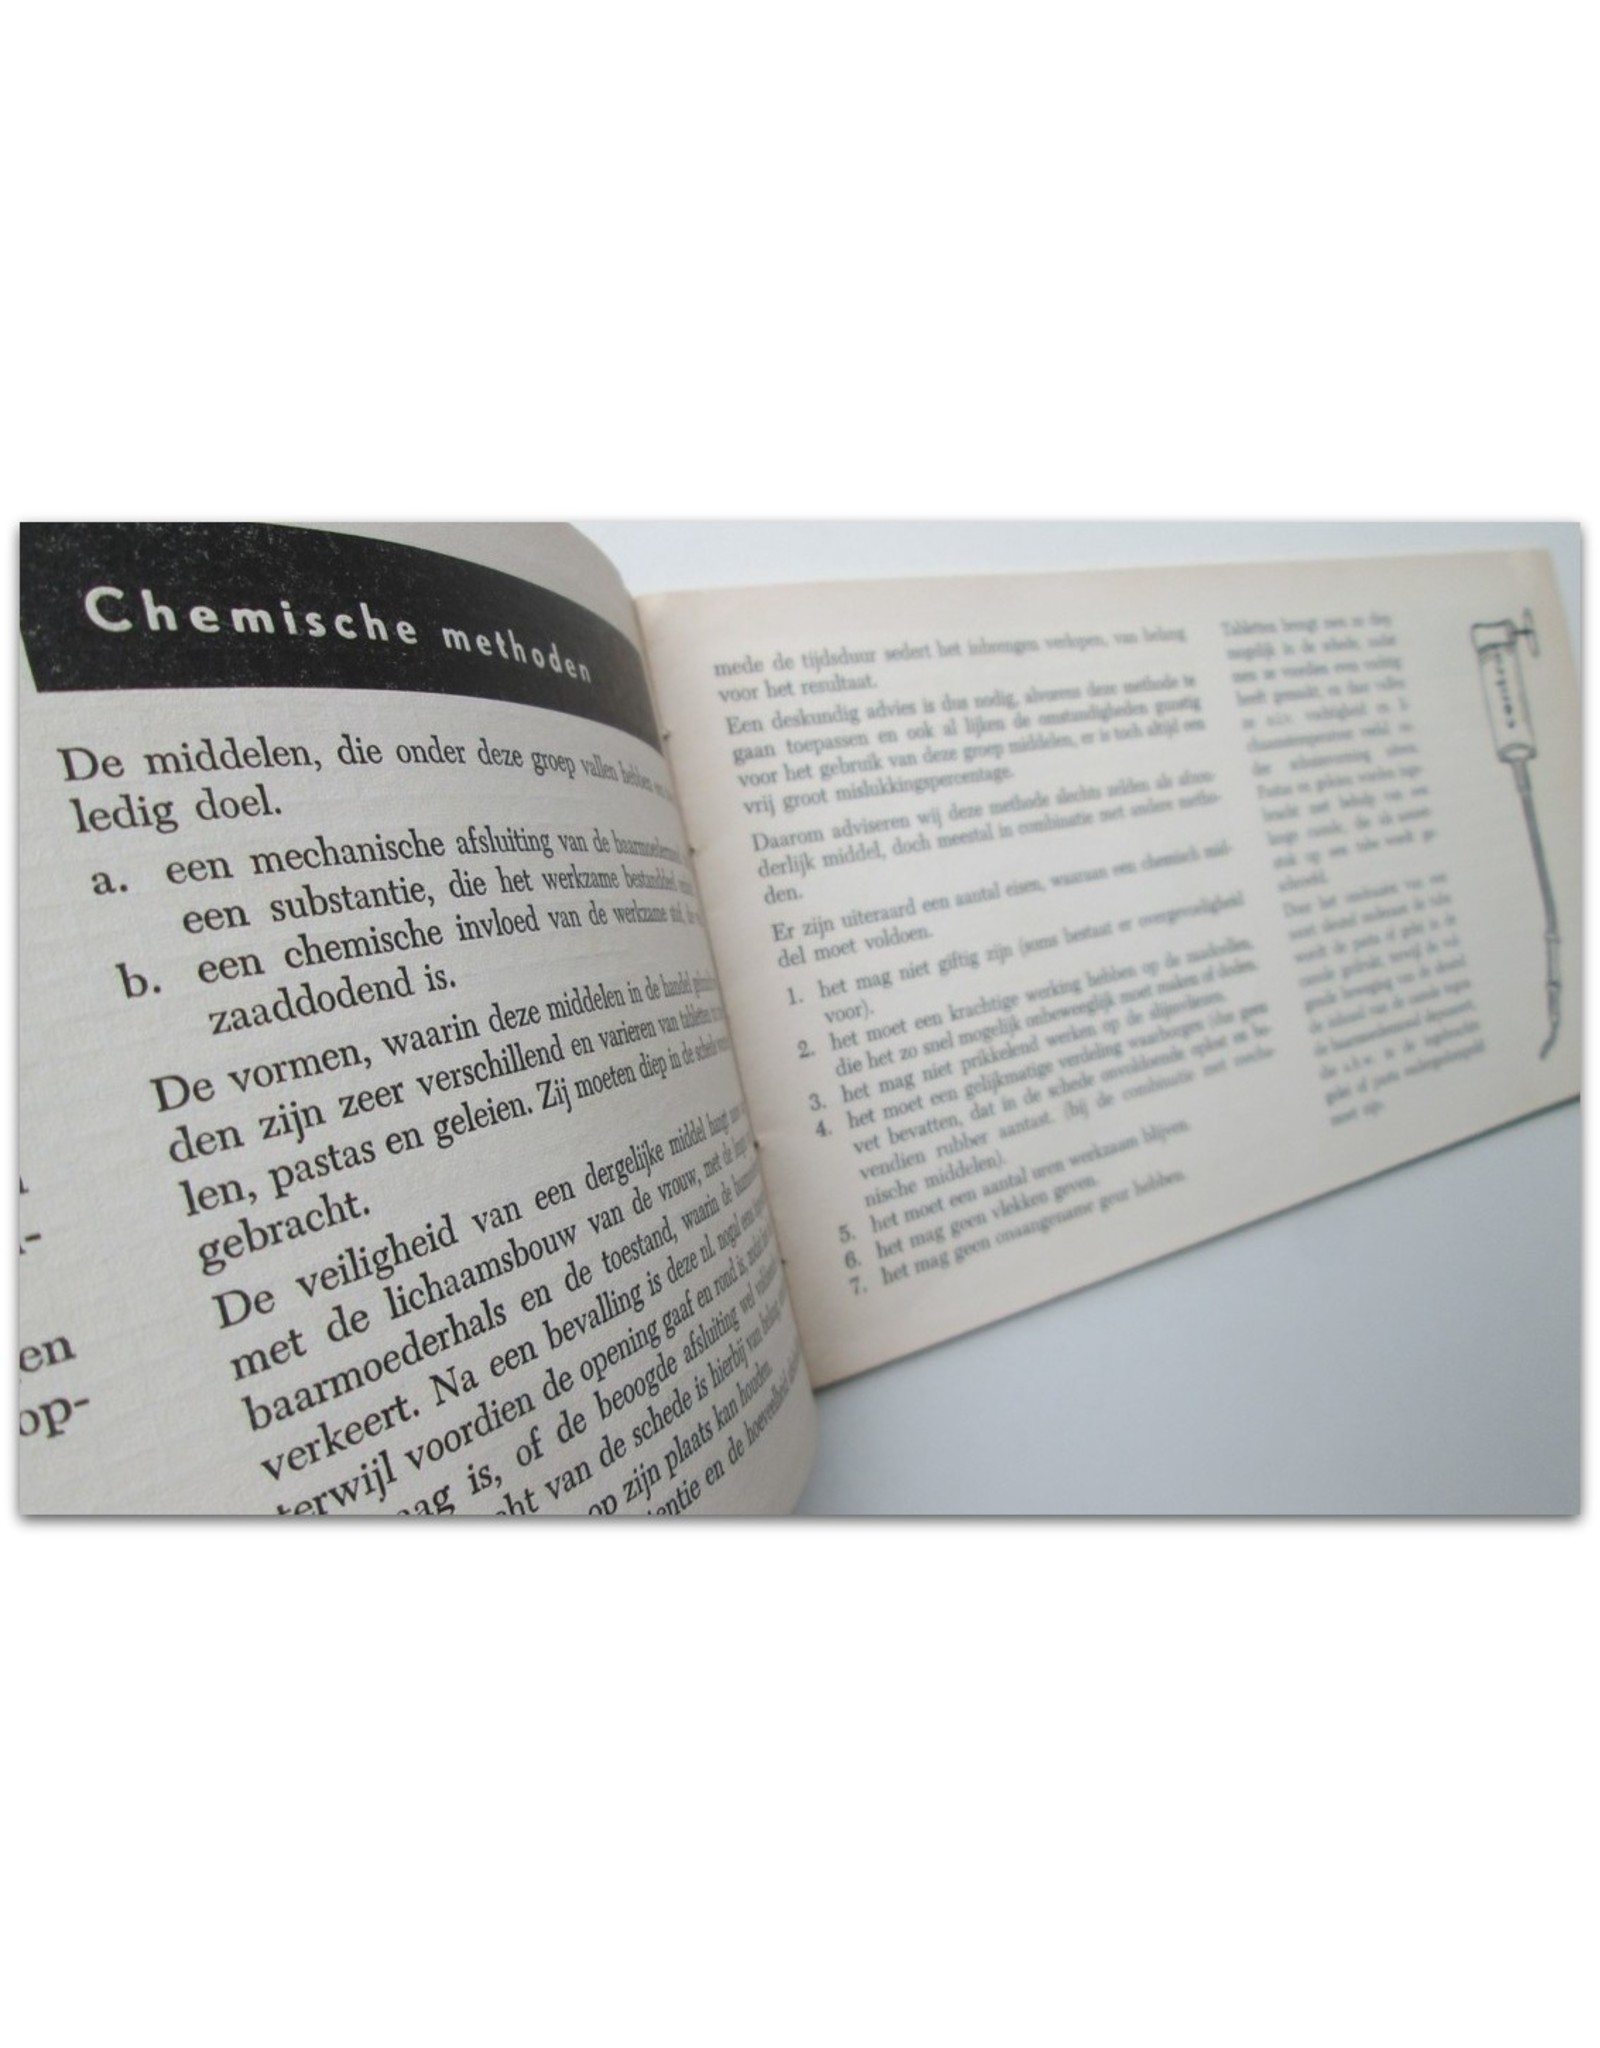 [NVSH] H.F. Fortuin Blitz - Verantwoorde geboortenregeling